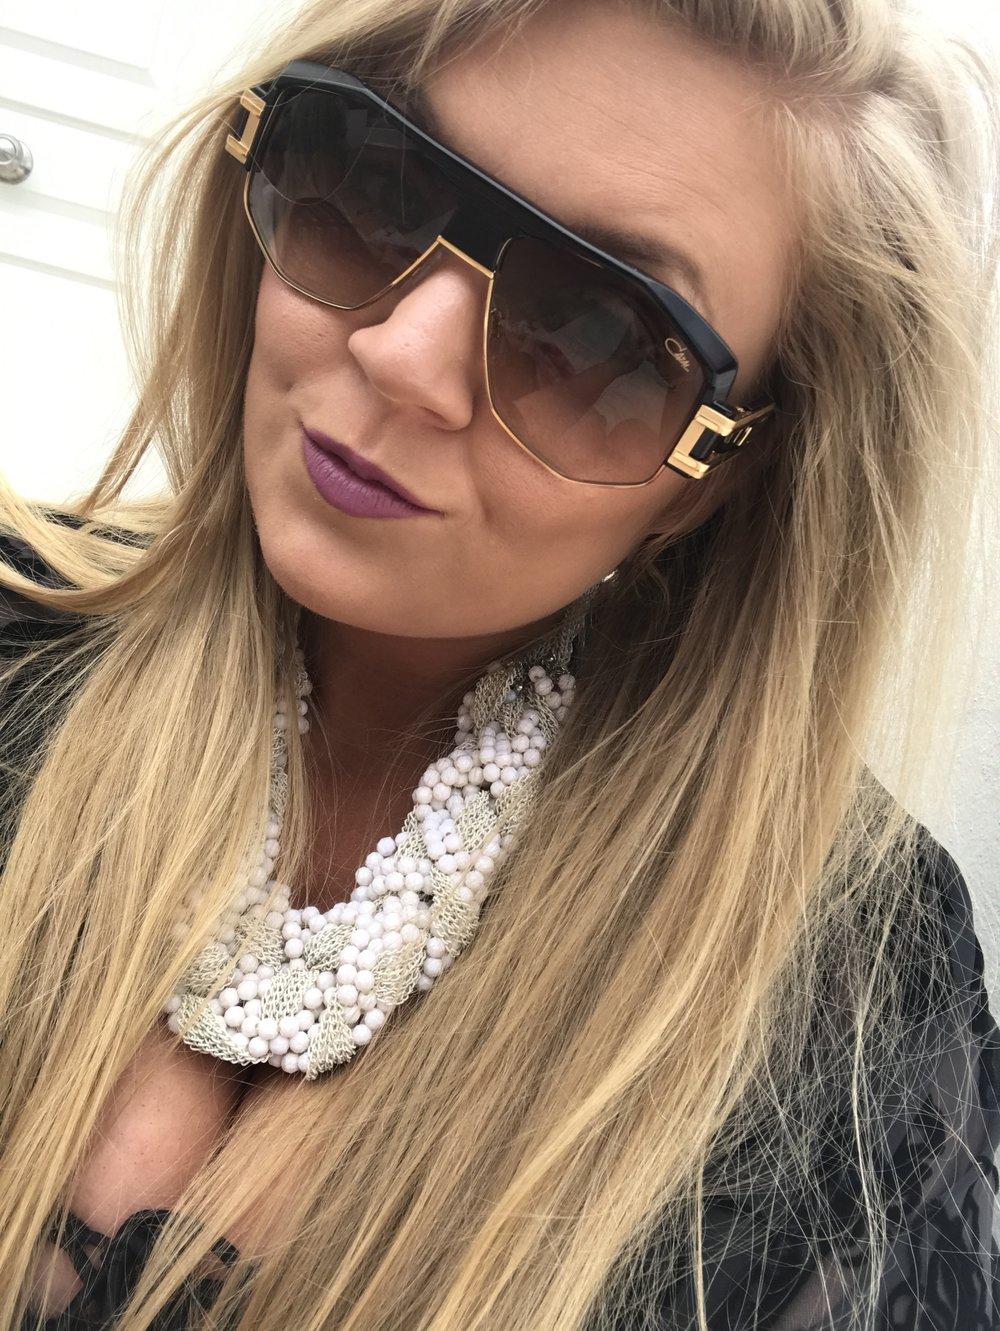 cazal_smart_buy_sunglasses_designer_sunglasses_what_to_wear_in_ibiza_ocean_beach_elle_blonde_luxury_lifestyle_blog-1